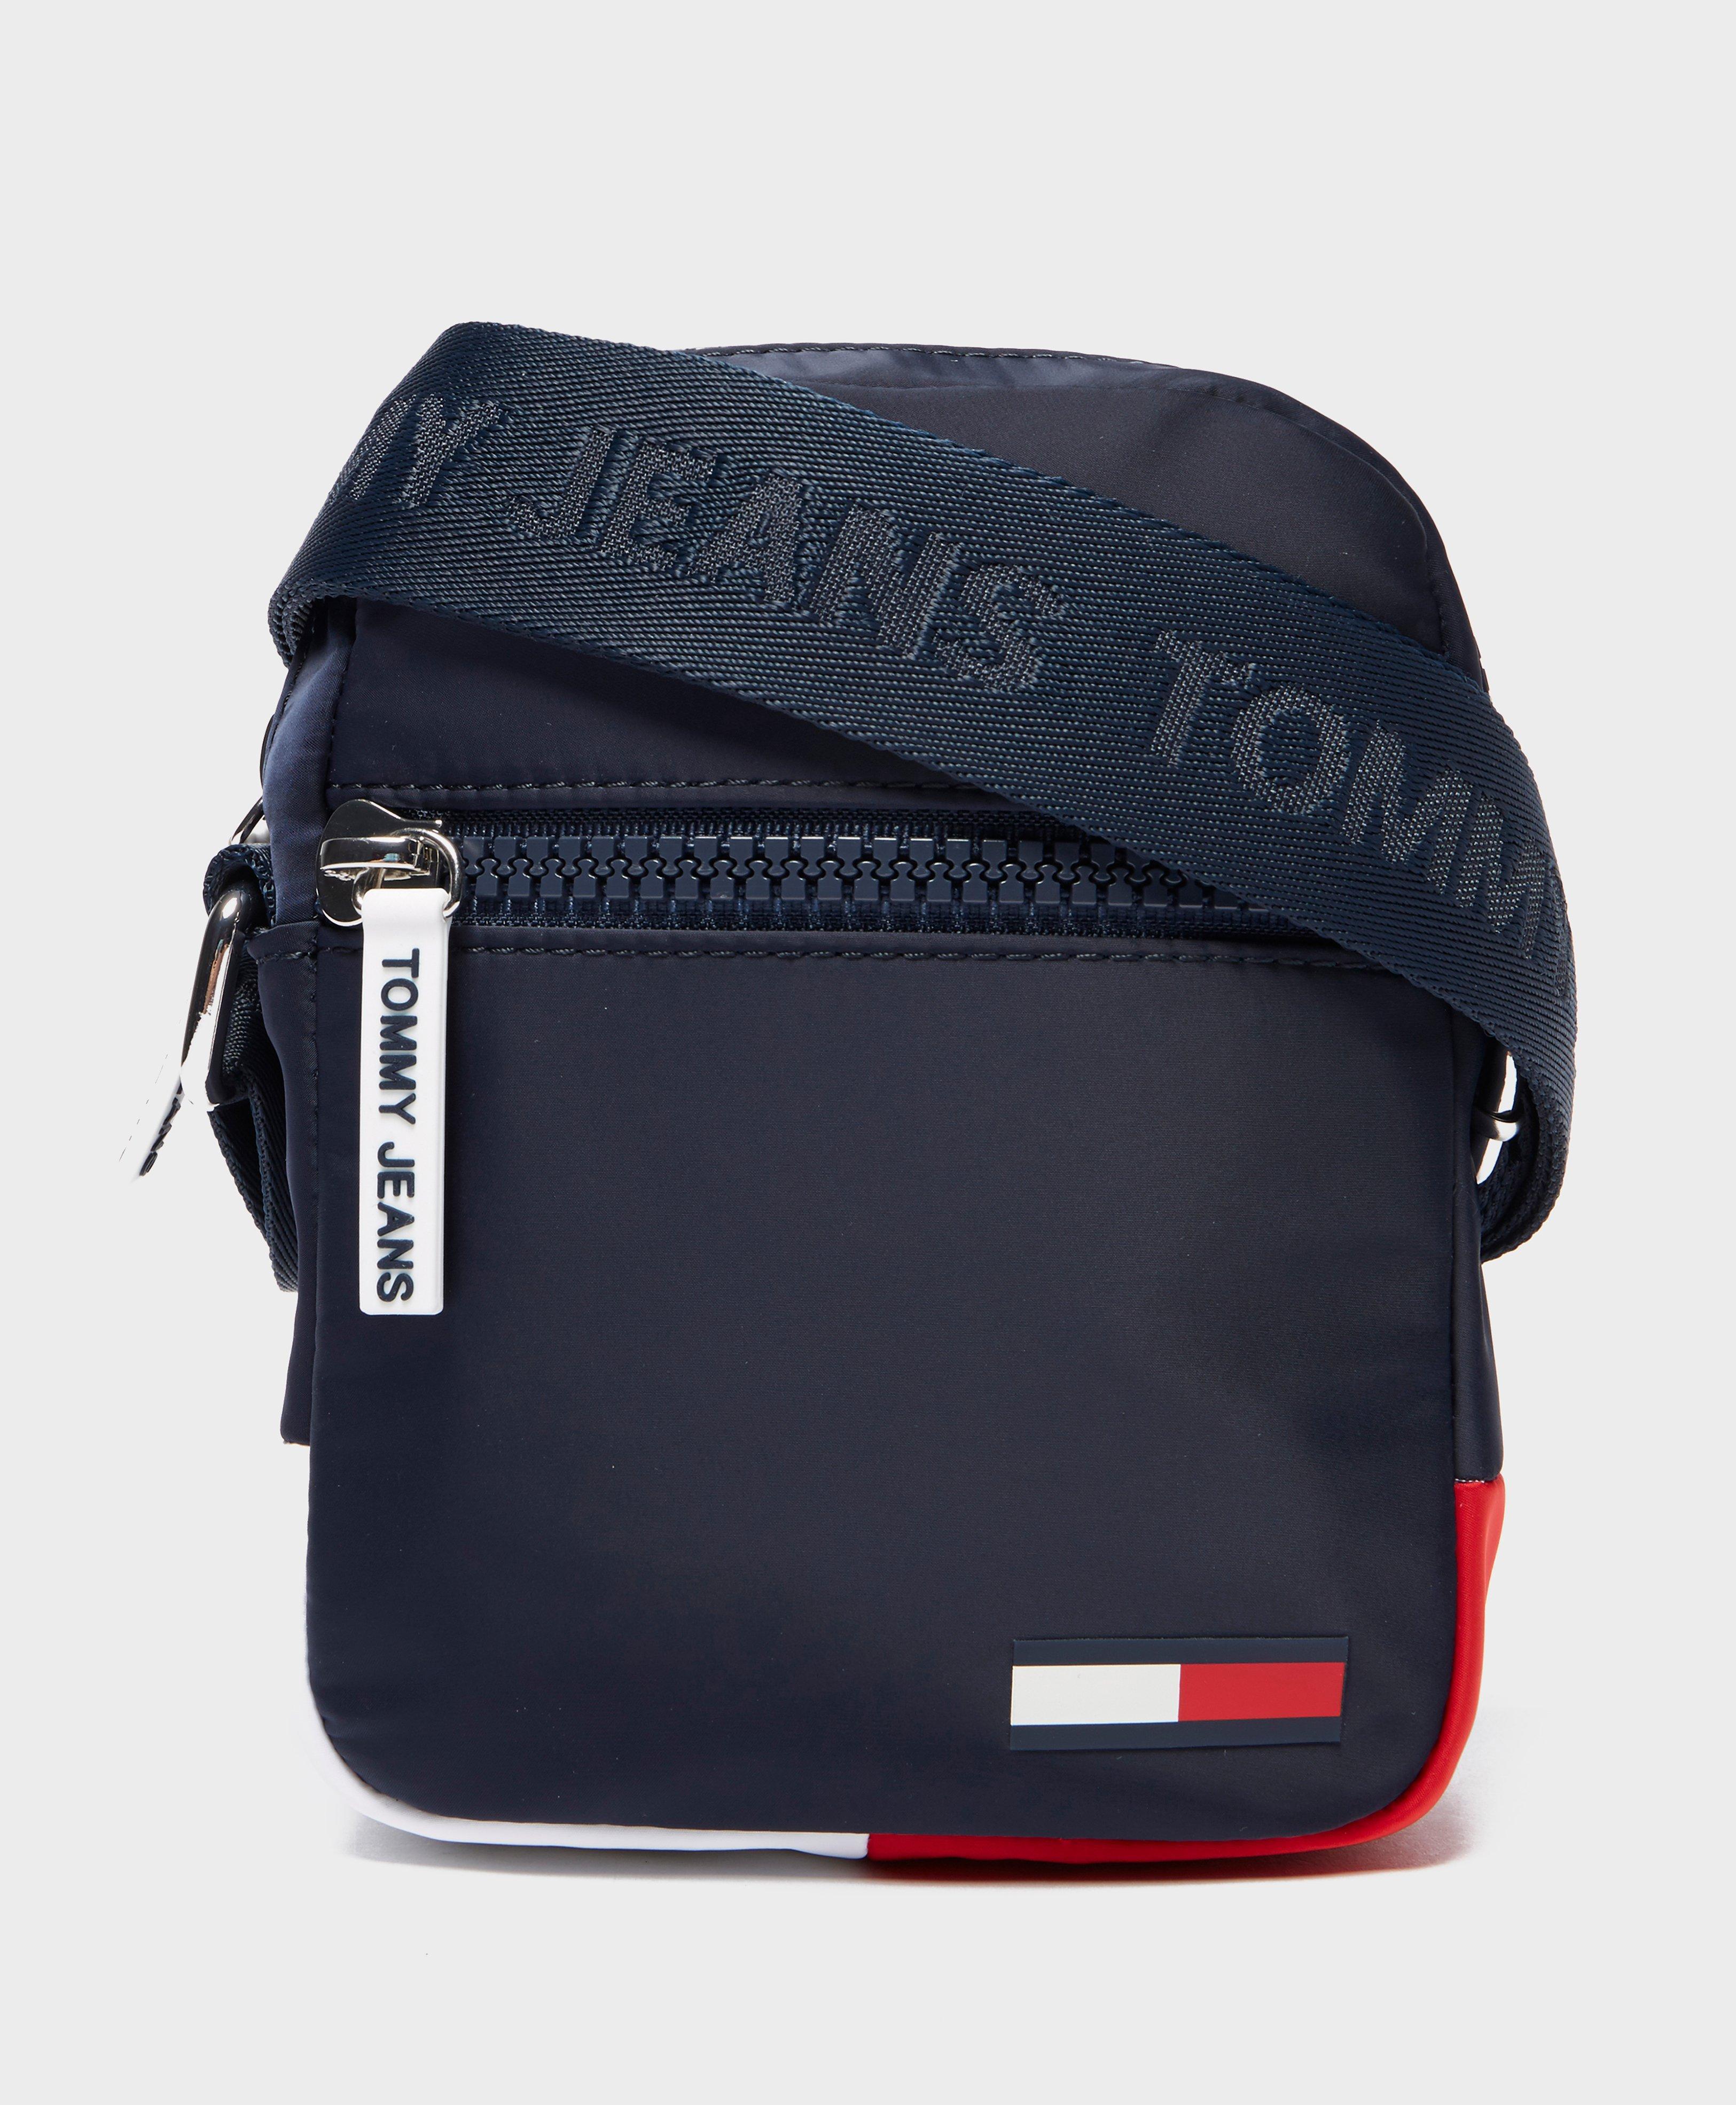 Tommy Hilfiger Mini Cross Body Bag In Blue For Men Lyst